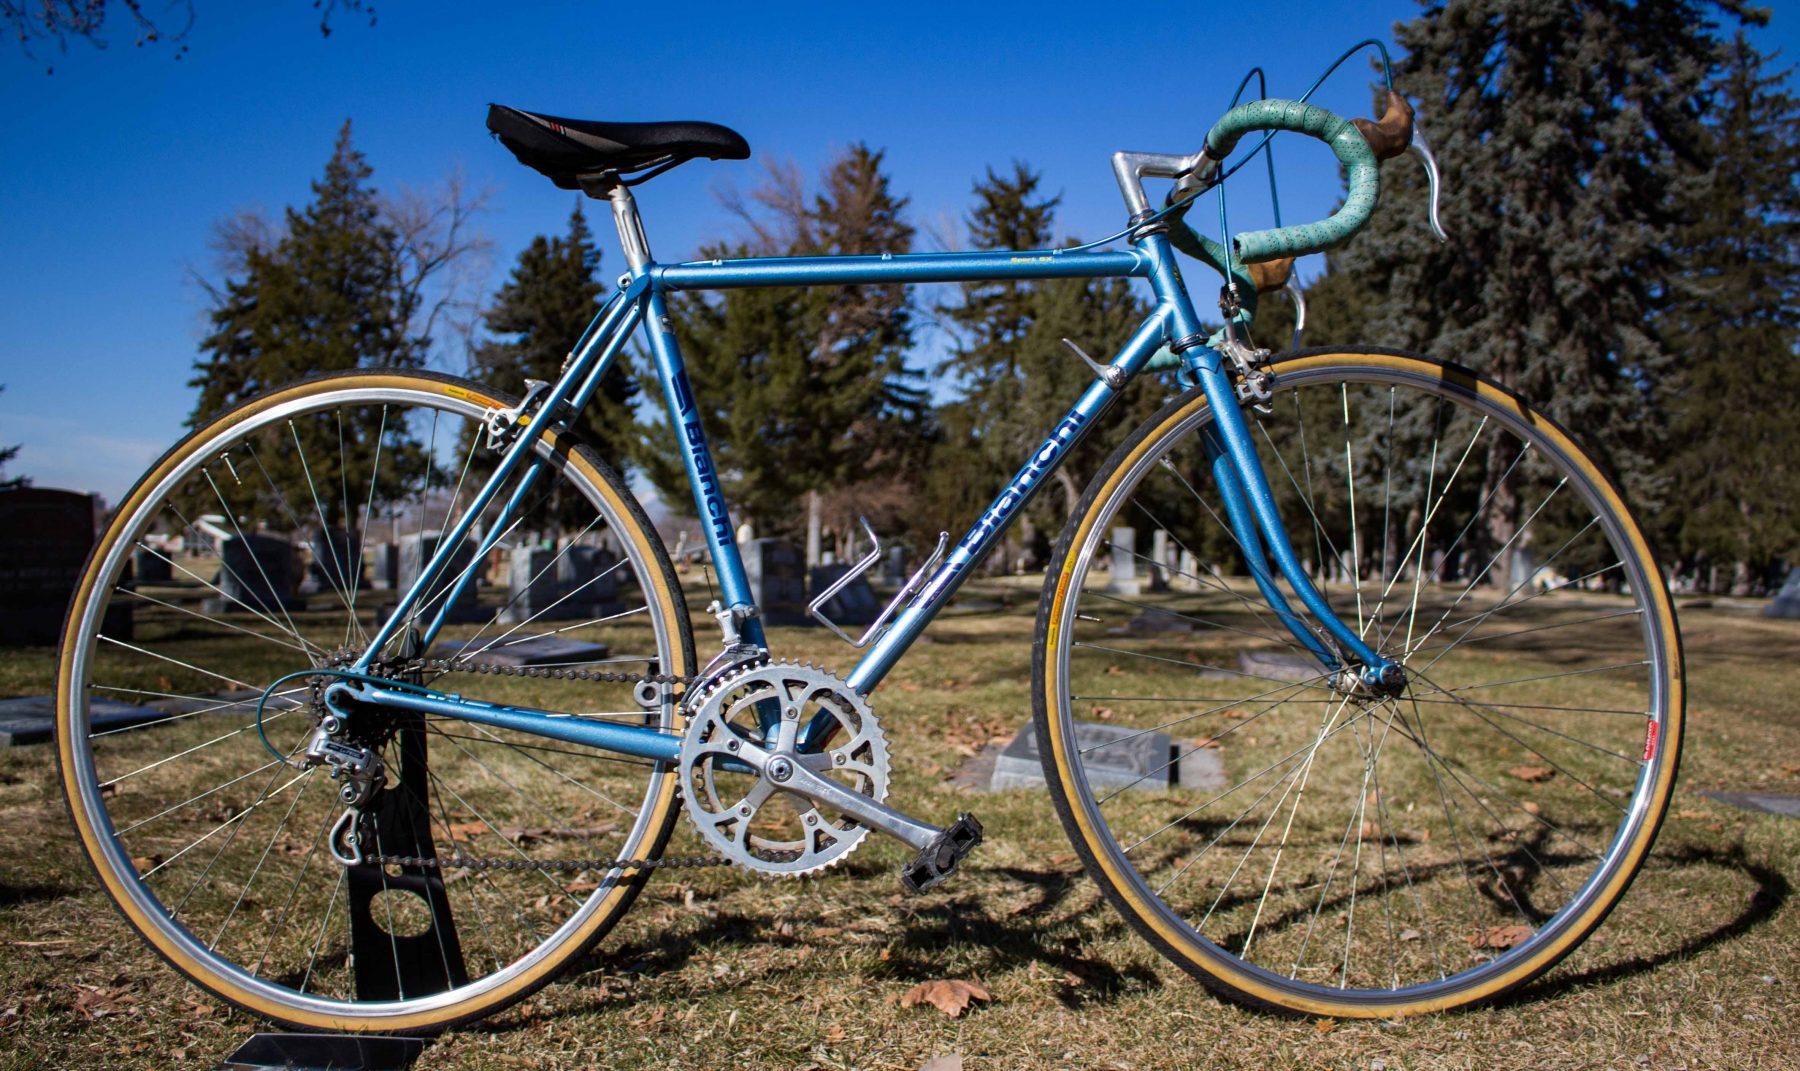 Bianchi-sport-sx-bicycle